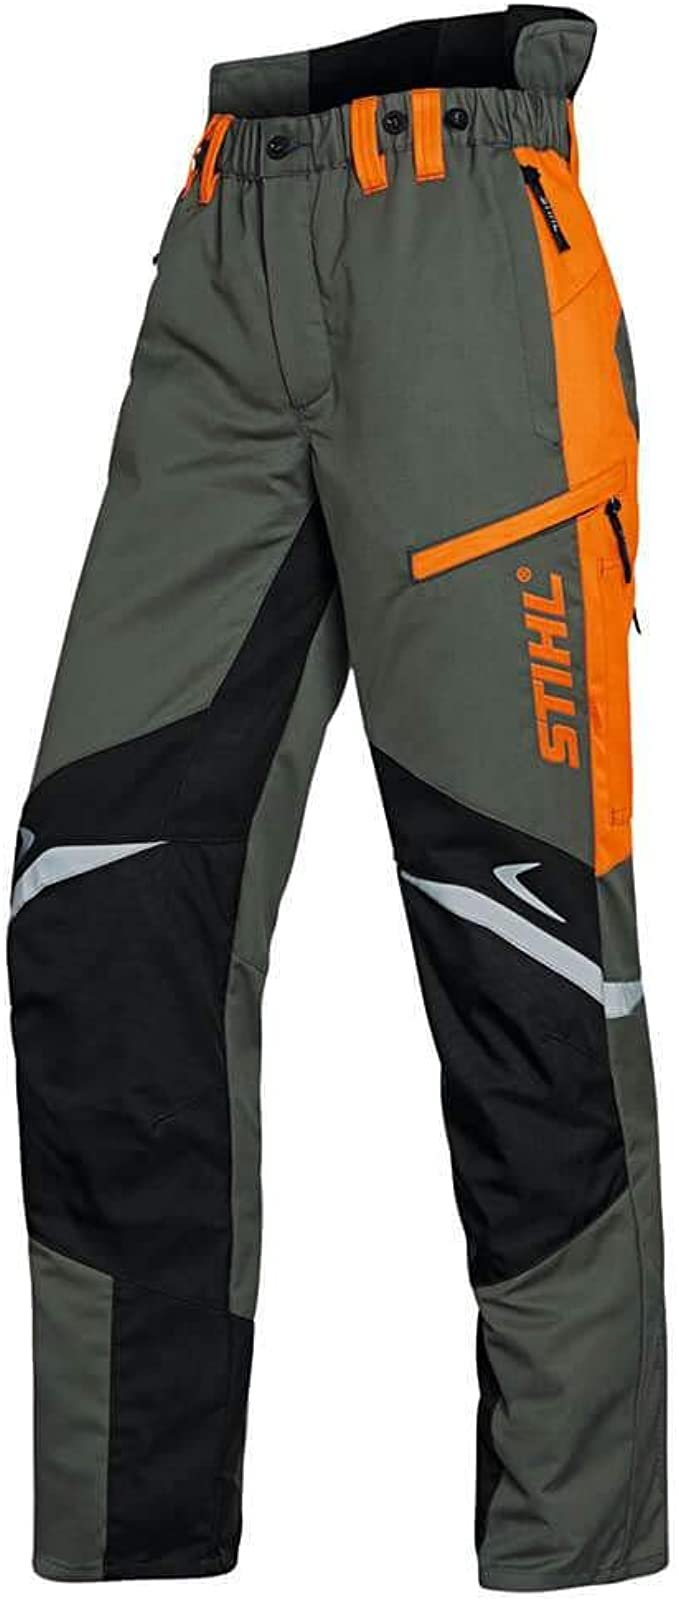 Pantaloni da lavoro Stihl Function Universal 2019